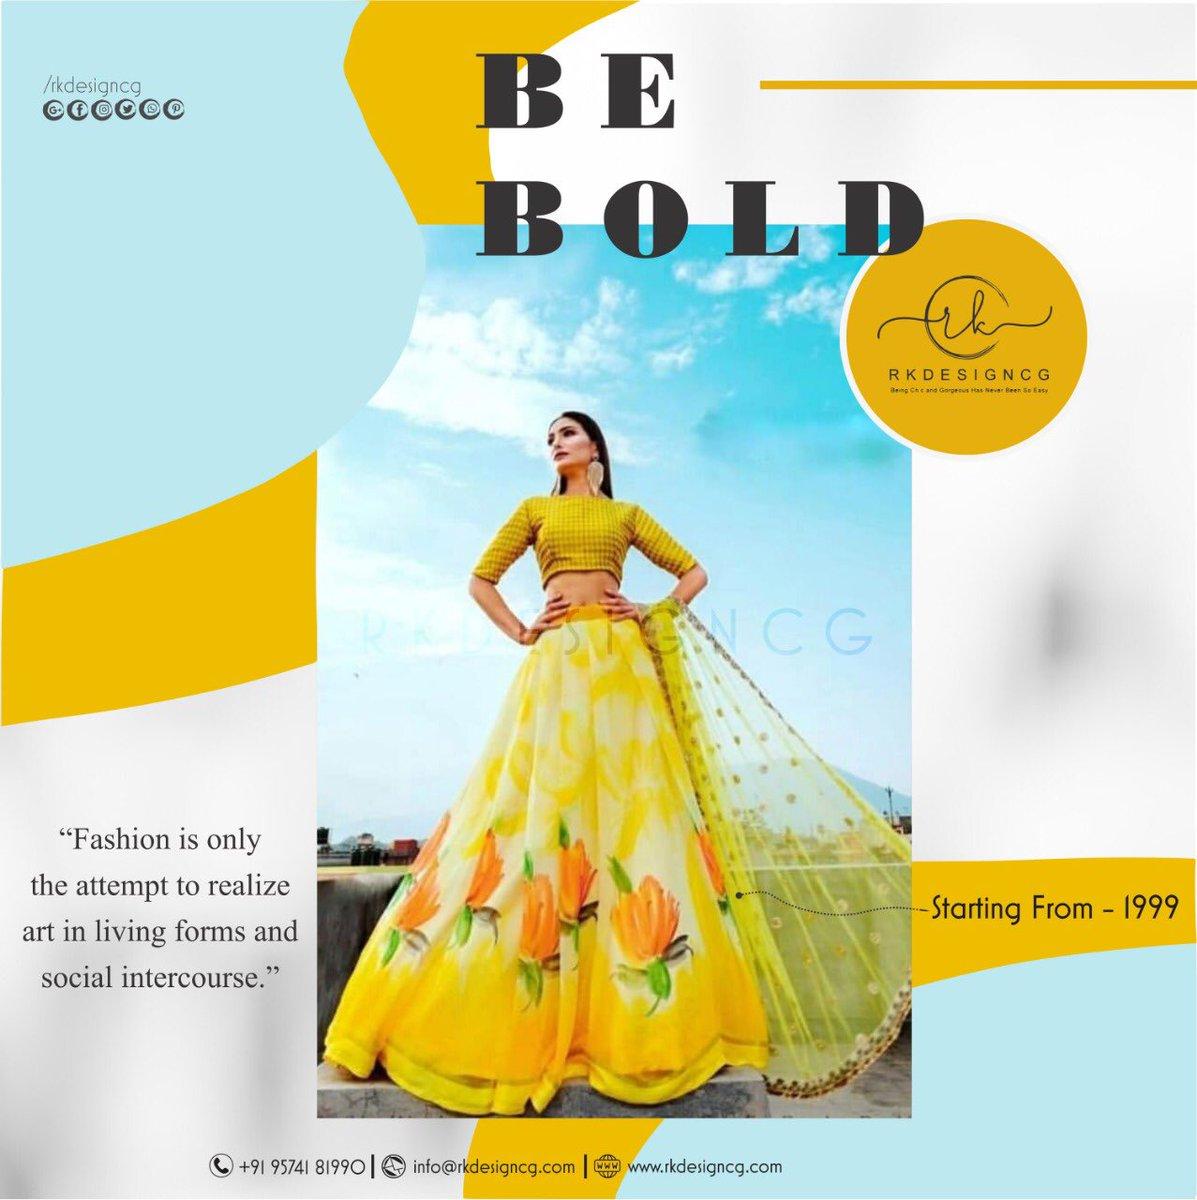 Happy Domingo. #dressup #fashion #dress #style #dresses #party #fashionista #ootd #love #like #instagram #outfit #follow #fashionstyle #longdress #rkdesigncg #womensfashion #fashionaddict #clothes #dressmurah #cute #fashionblogger #summer #makeup #music #wedding #miraclenikki